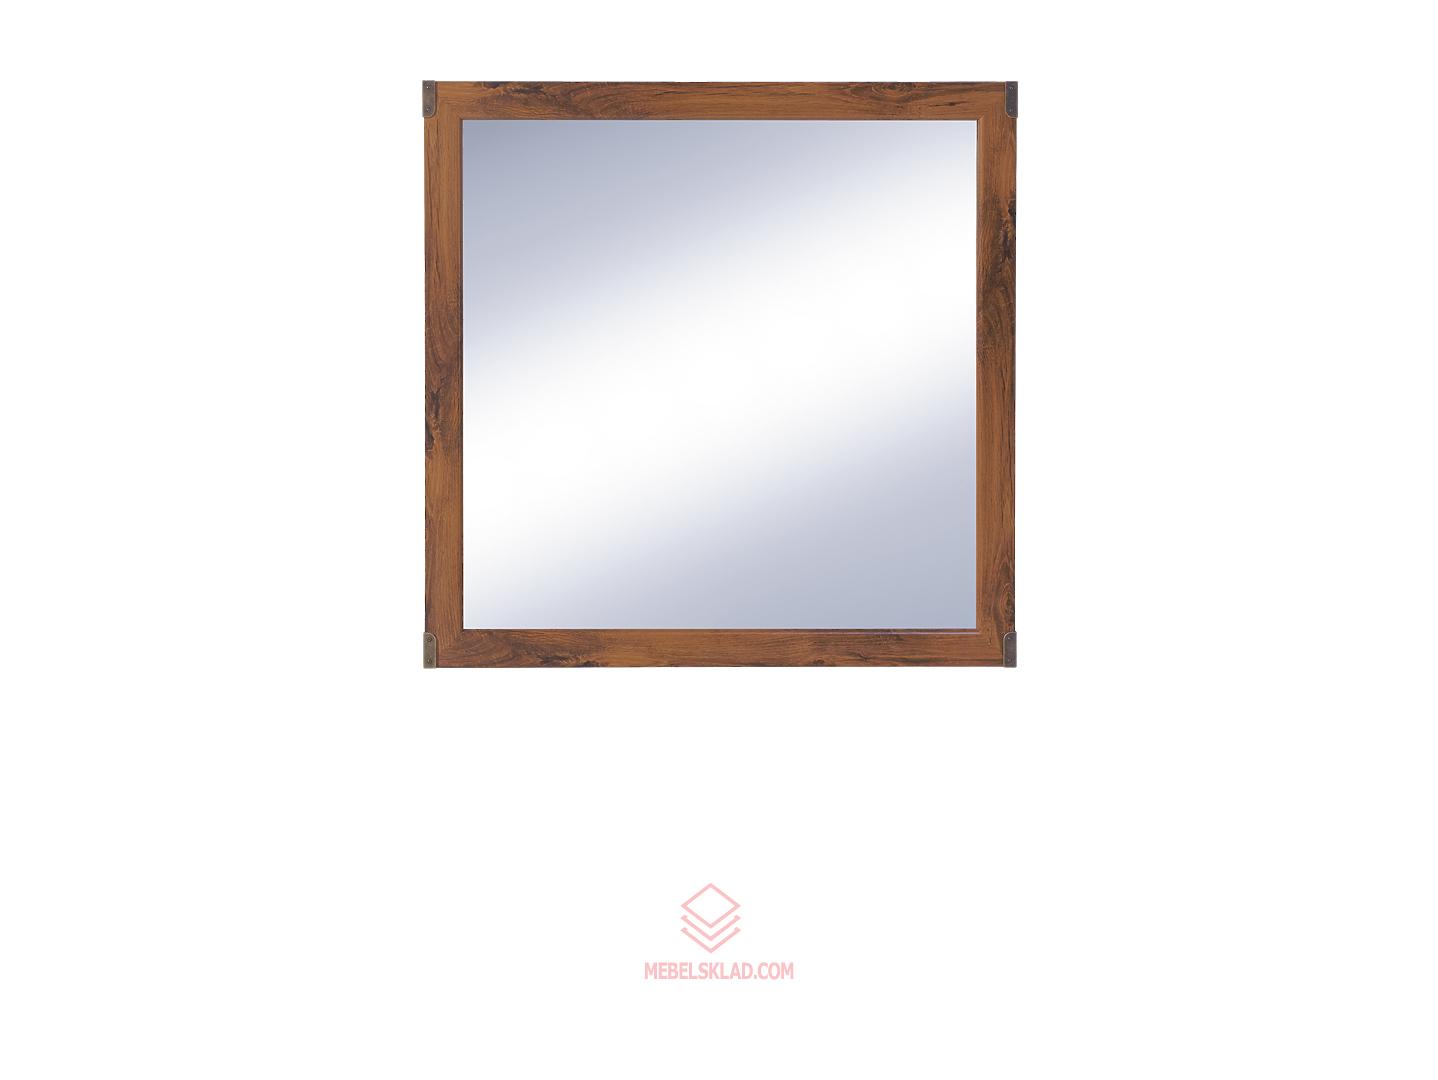 Зеркало ИНДИАНА JLUS 80 за 3962 ₽